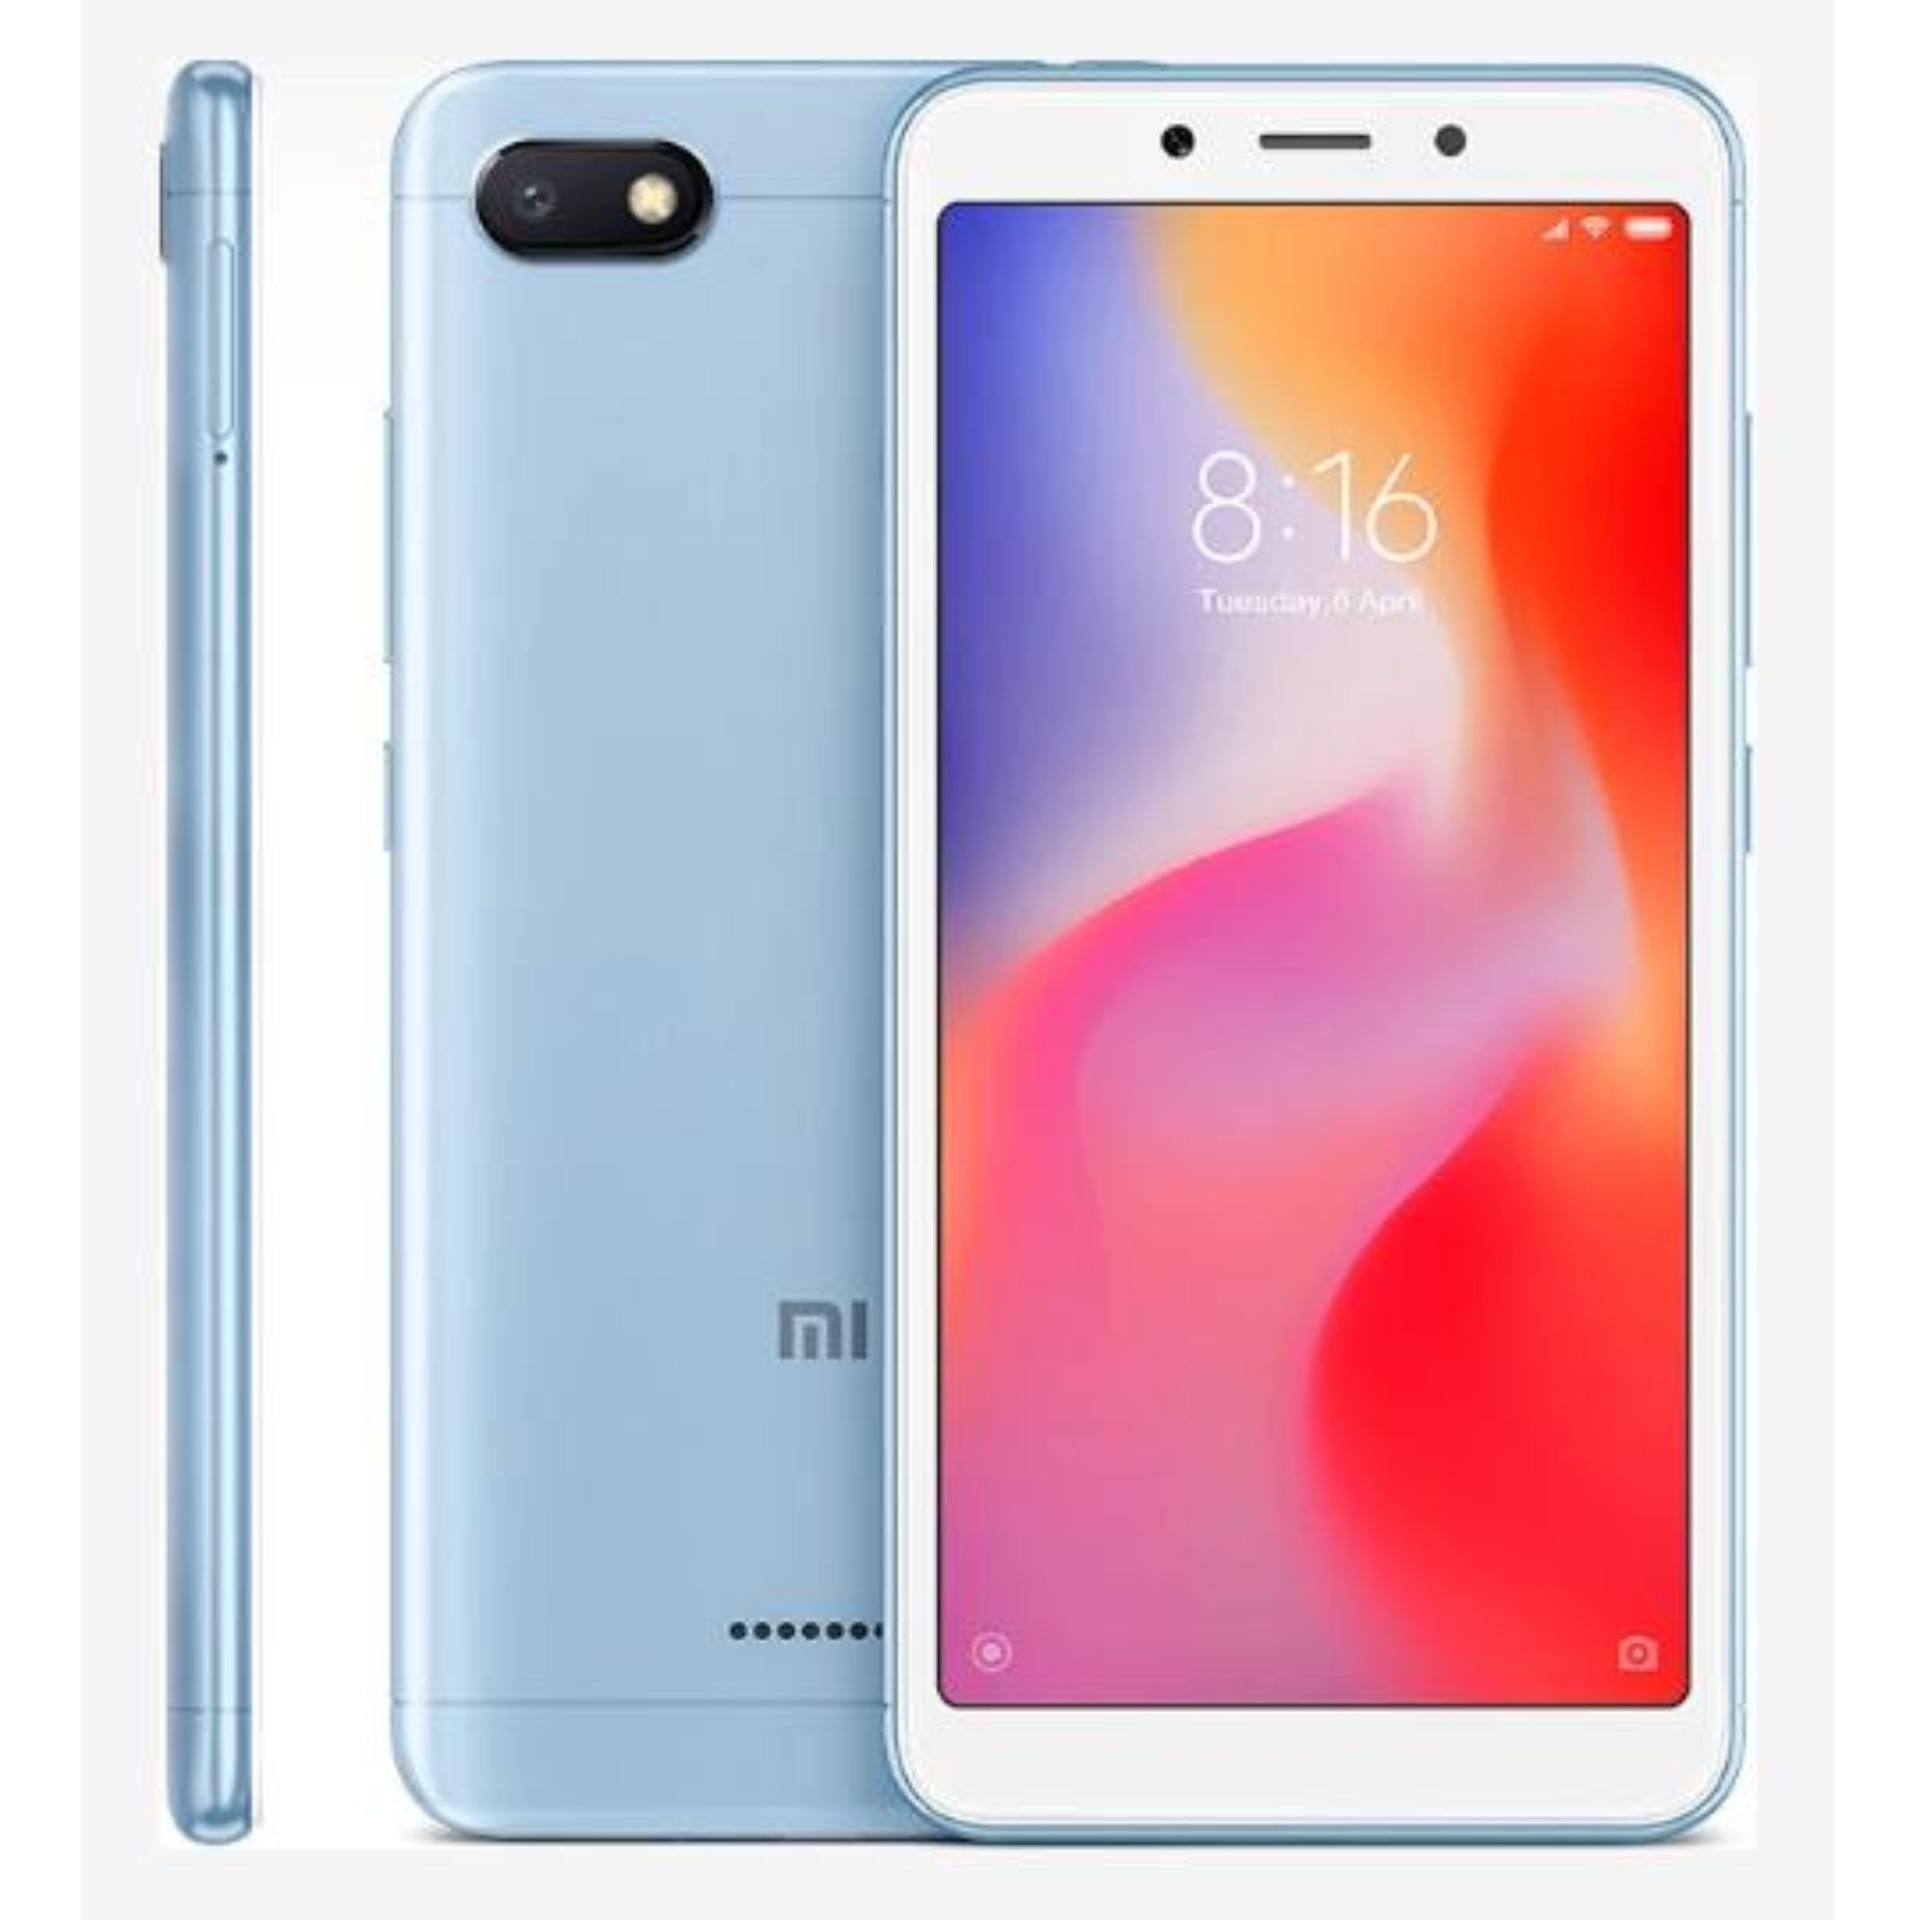 Buy 2018 Mobile Phones Online Best Prices In Pakistan Oppo F9 Blue Ram 4gb 64gb Redmi 6a 545 2gb 16gb Rom Hybrid Dual Sim